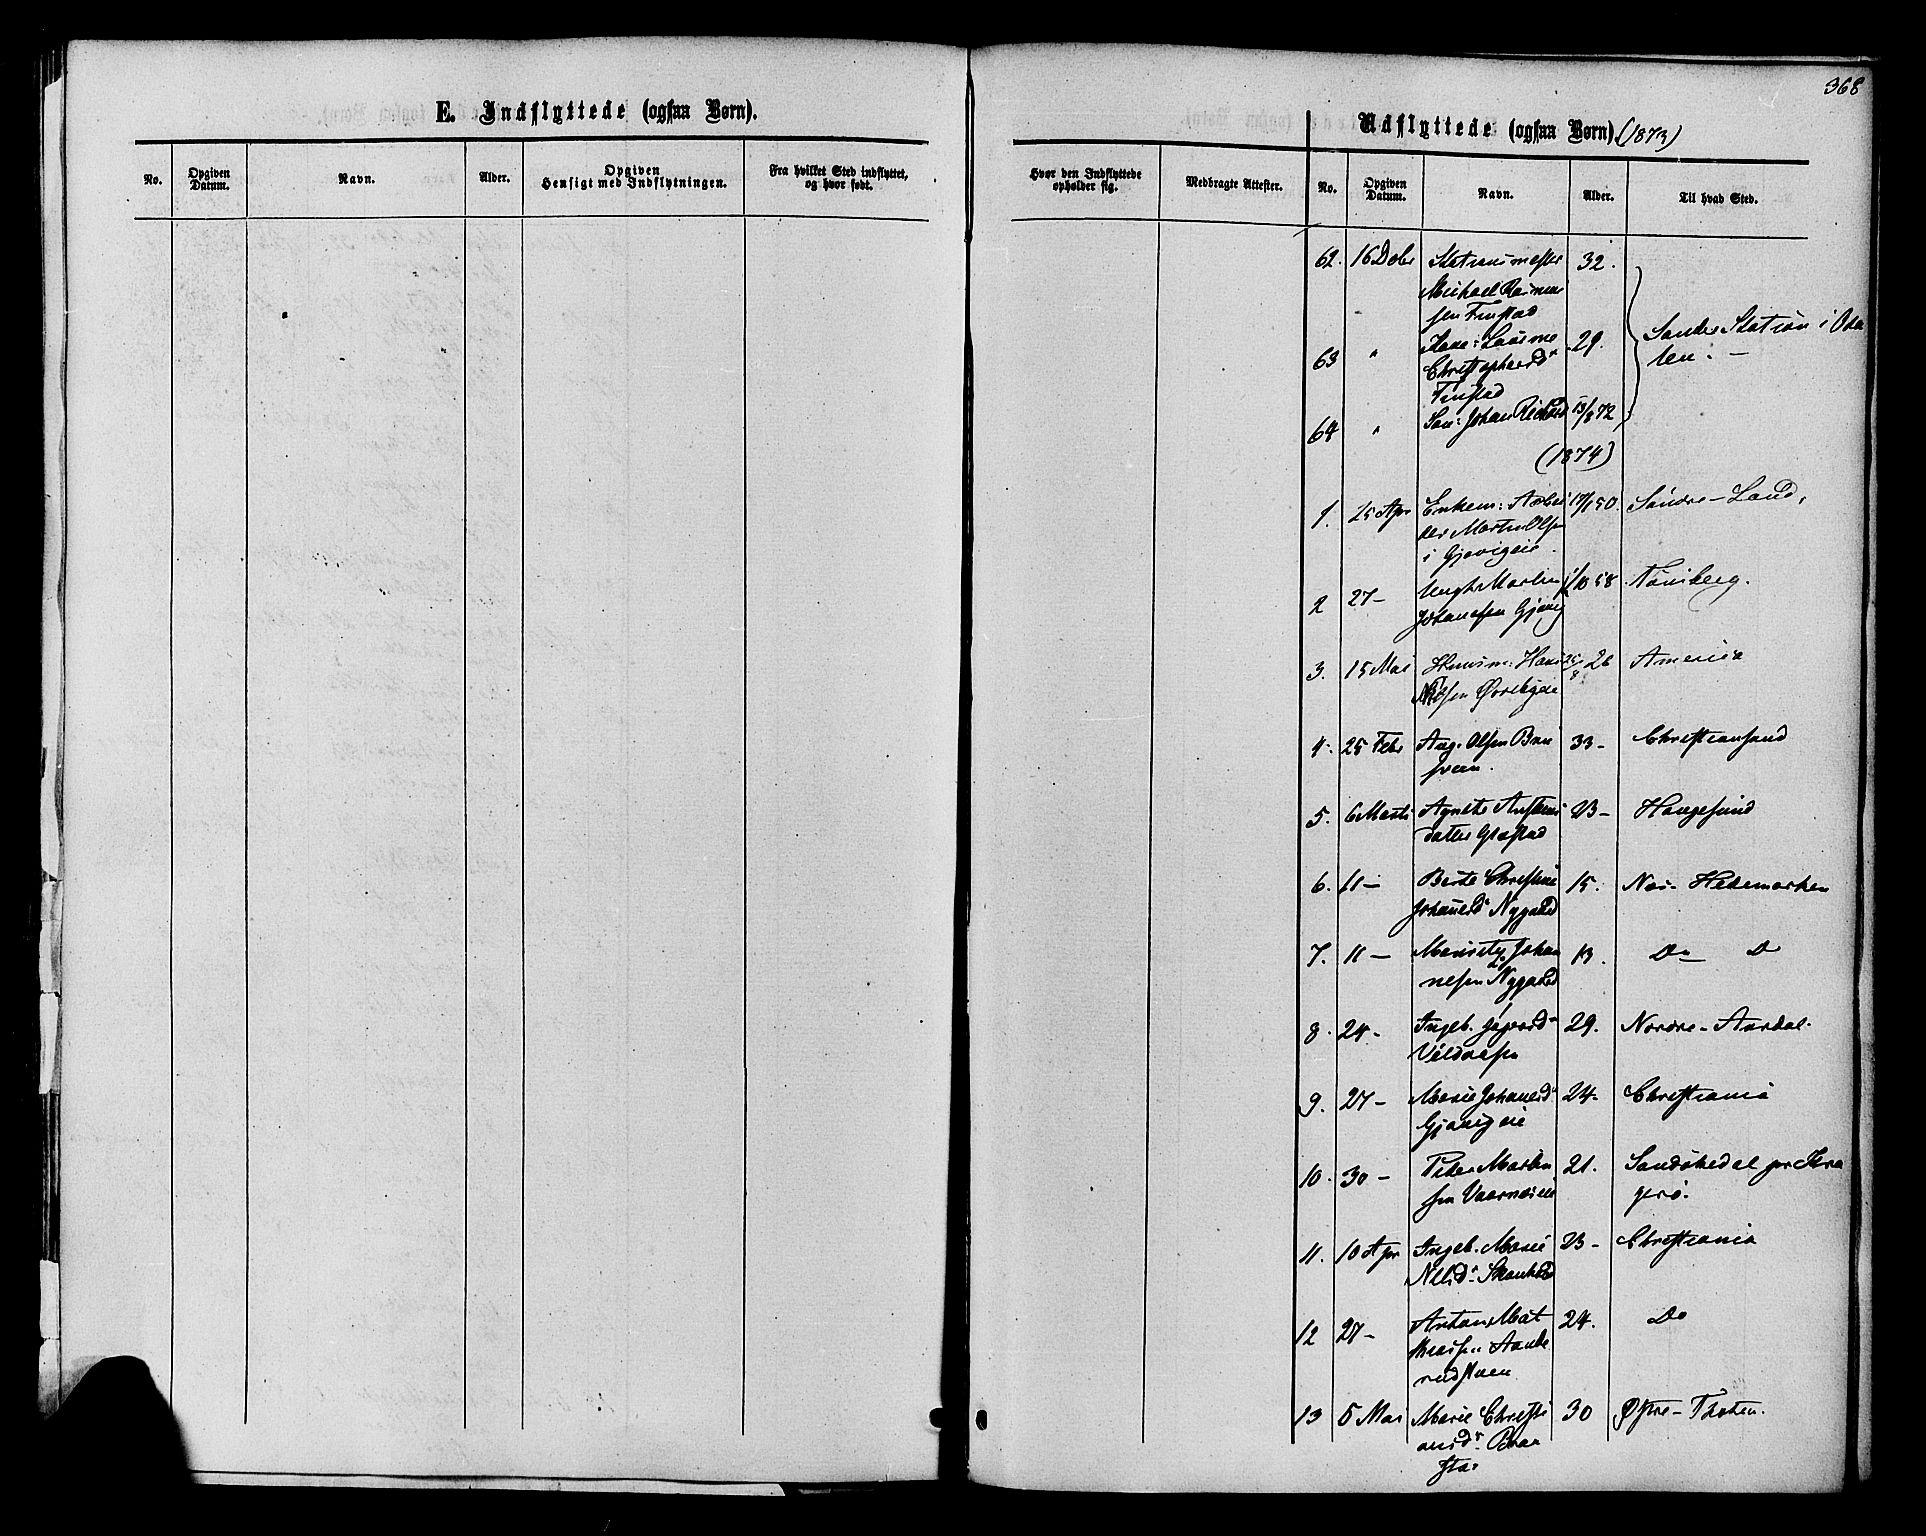 SAH, Vardal prestekontor, H/Ha/Haa/L0007: Ministerialbok nr. 7, 1867-1878, s. 368